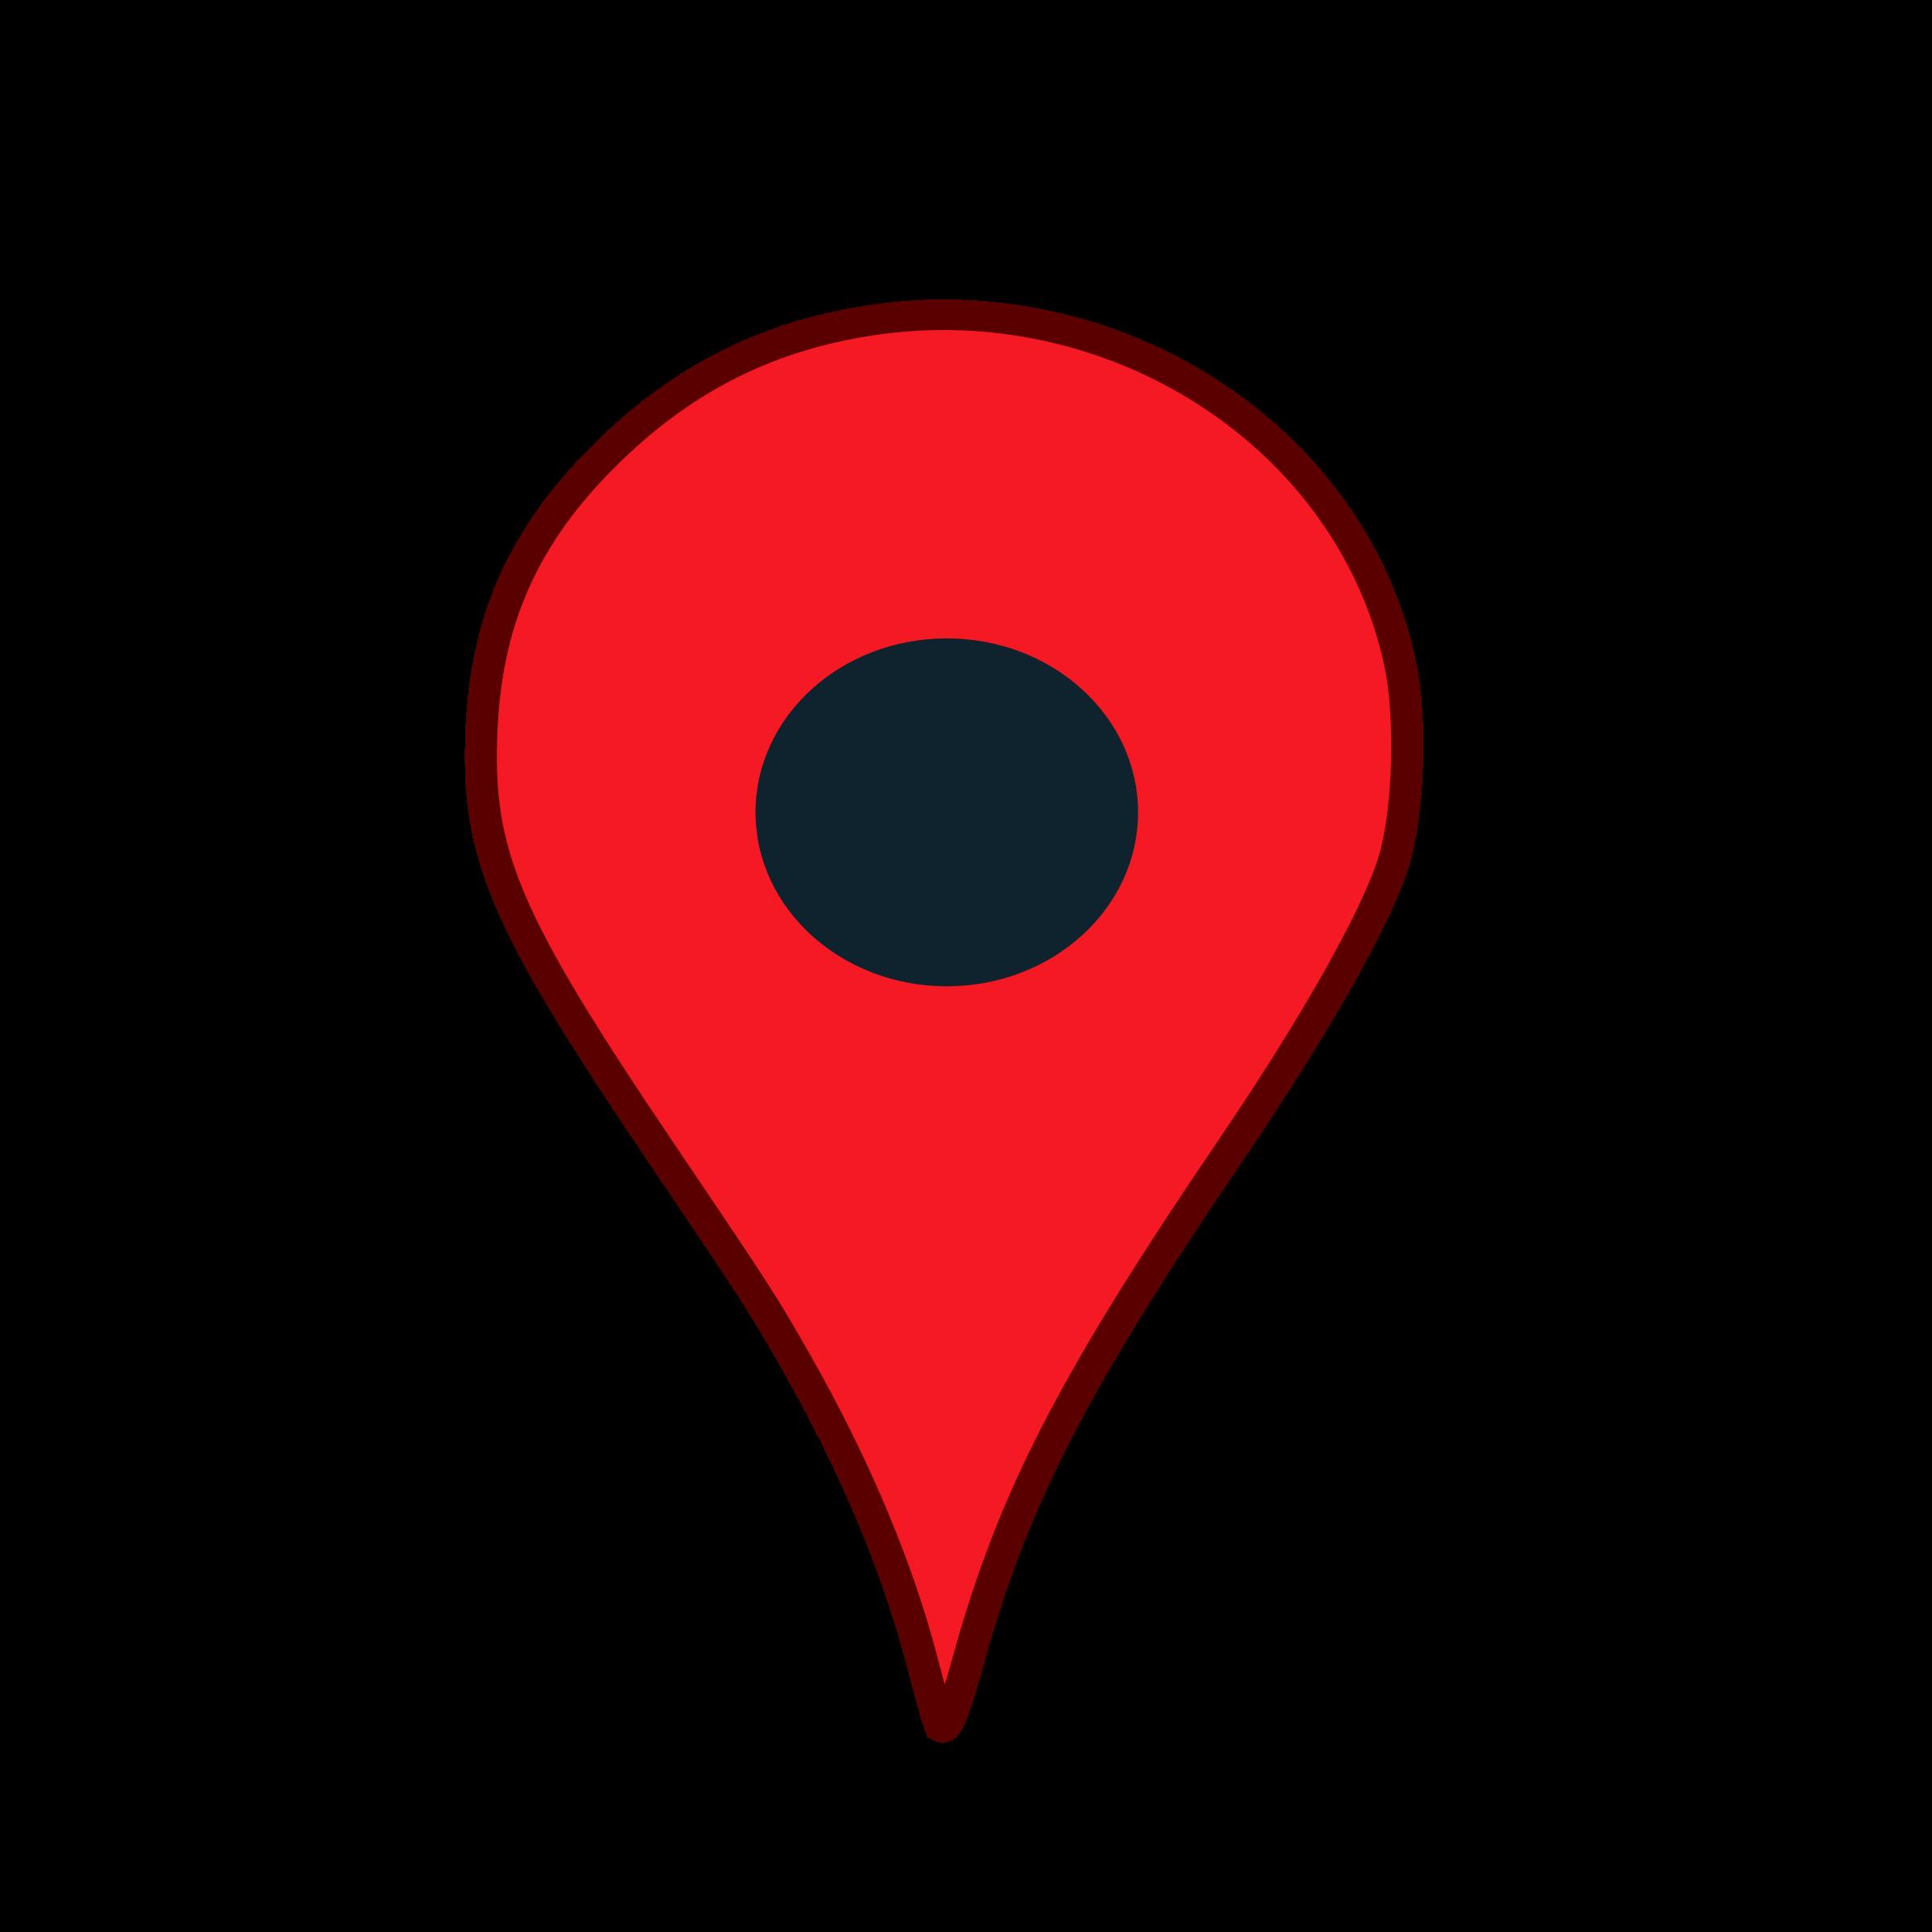 Location clipart navigation, Location navigation Transparent.